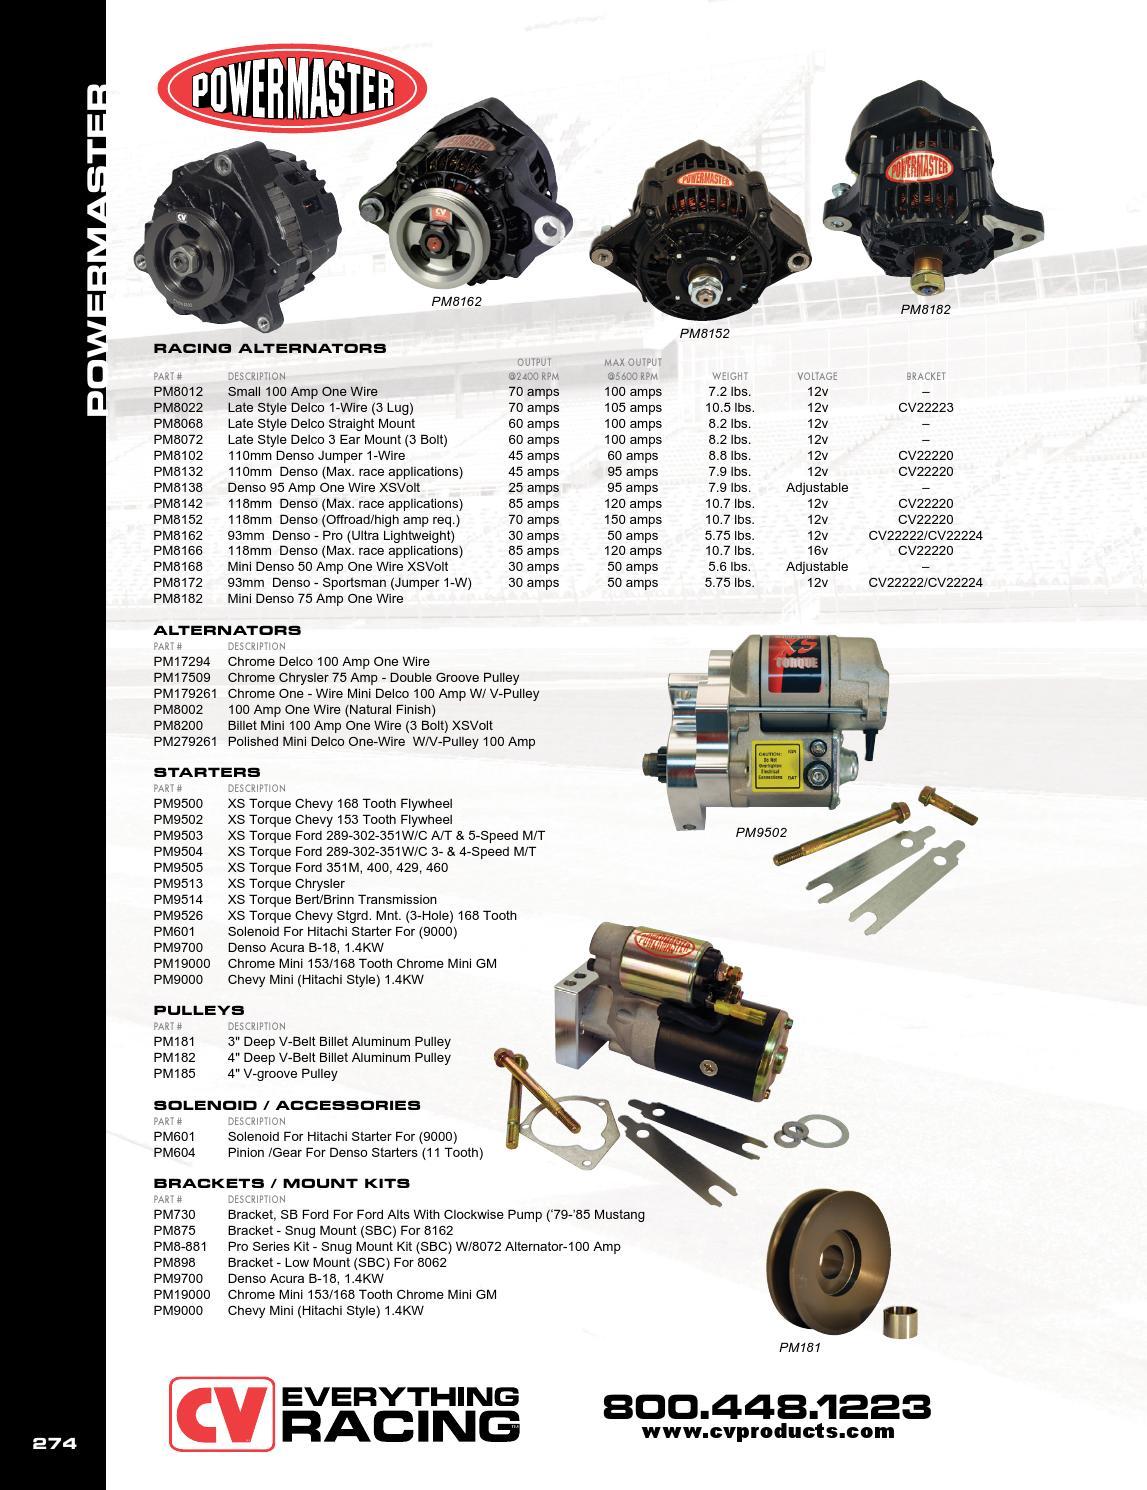 Denso 136 Amp Alternator Wiring 03 Bmw 745li Fuse Box 100 Gm Cv Products Catalog Volume 14 By Joshua Powers Issuu Page 274